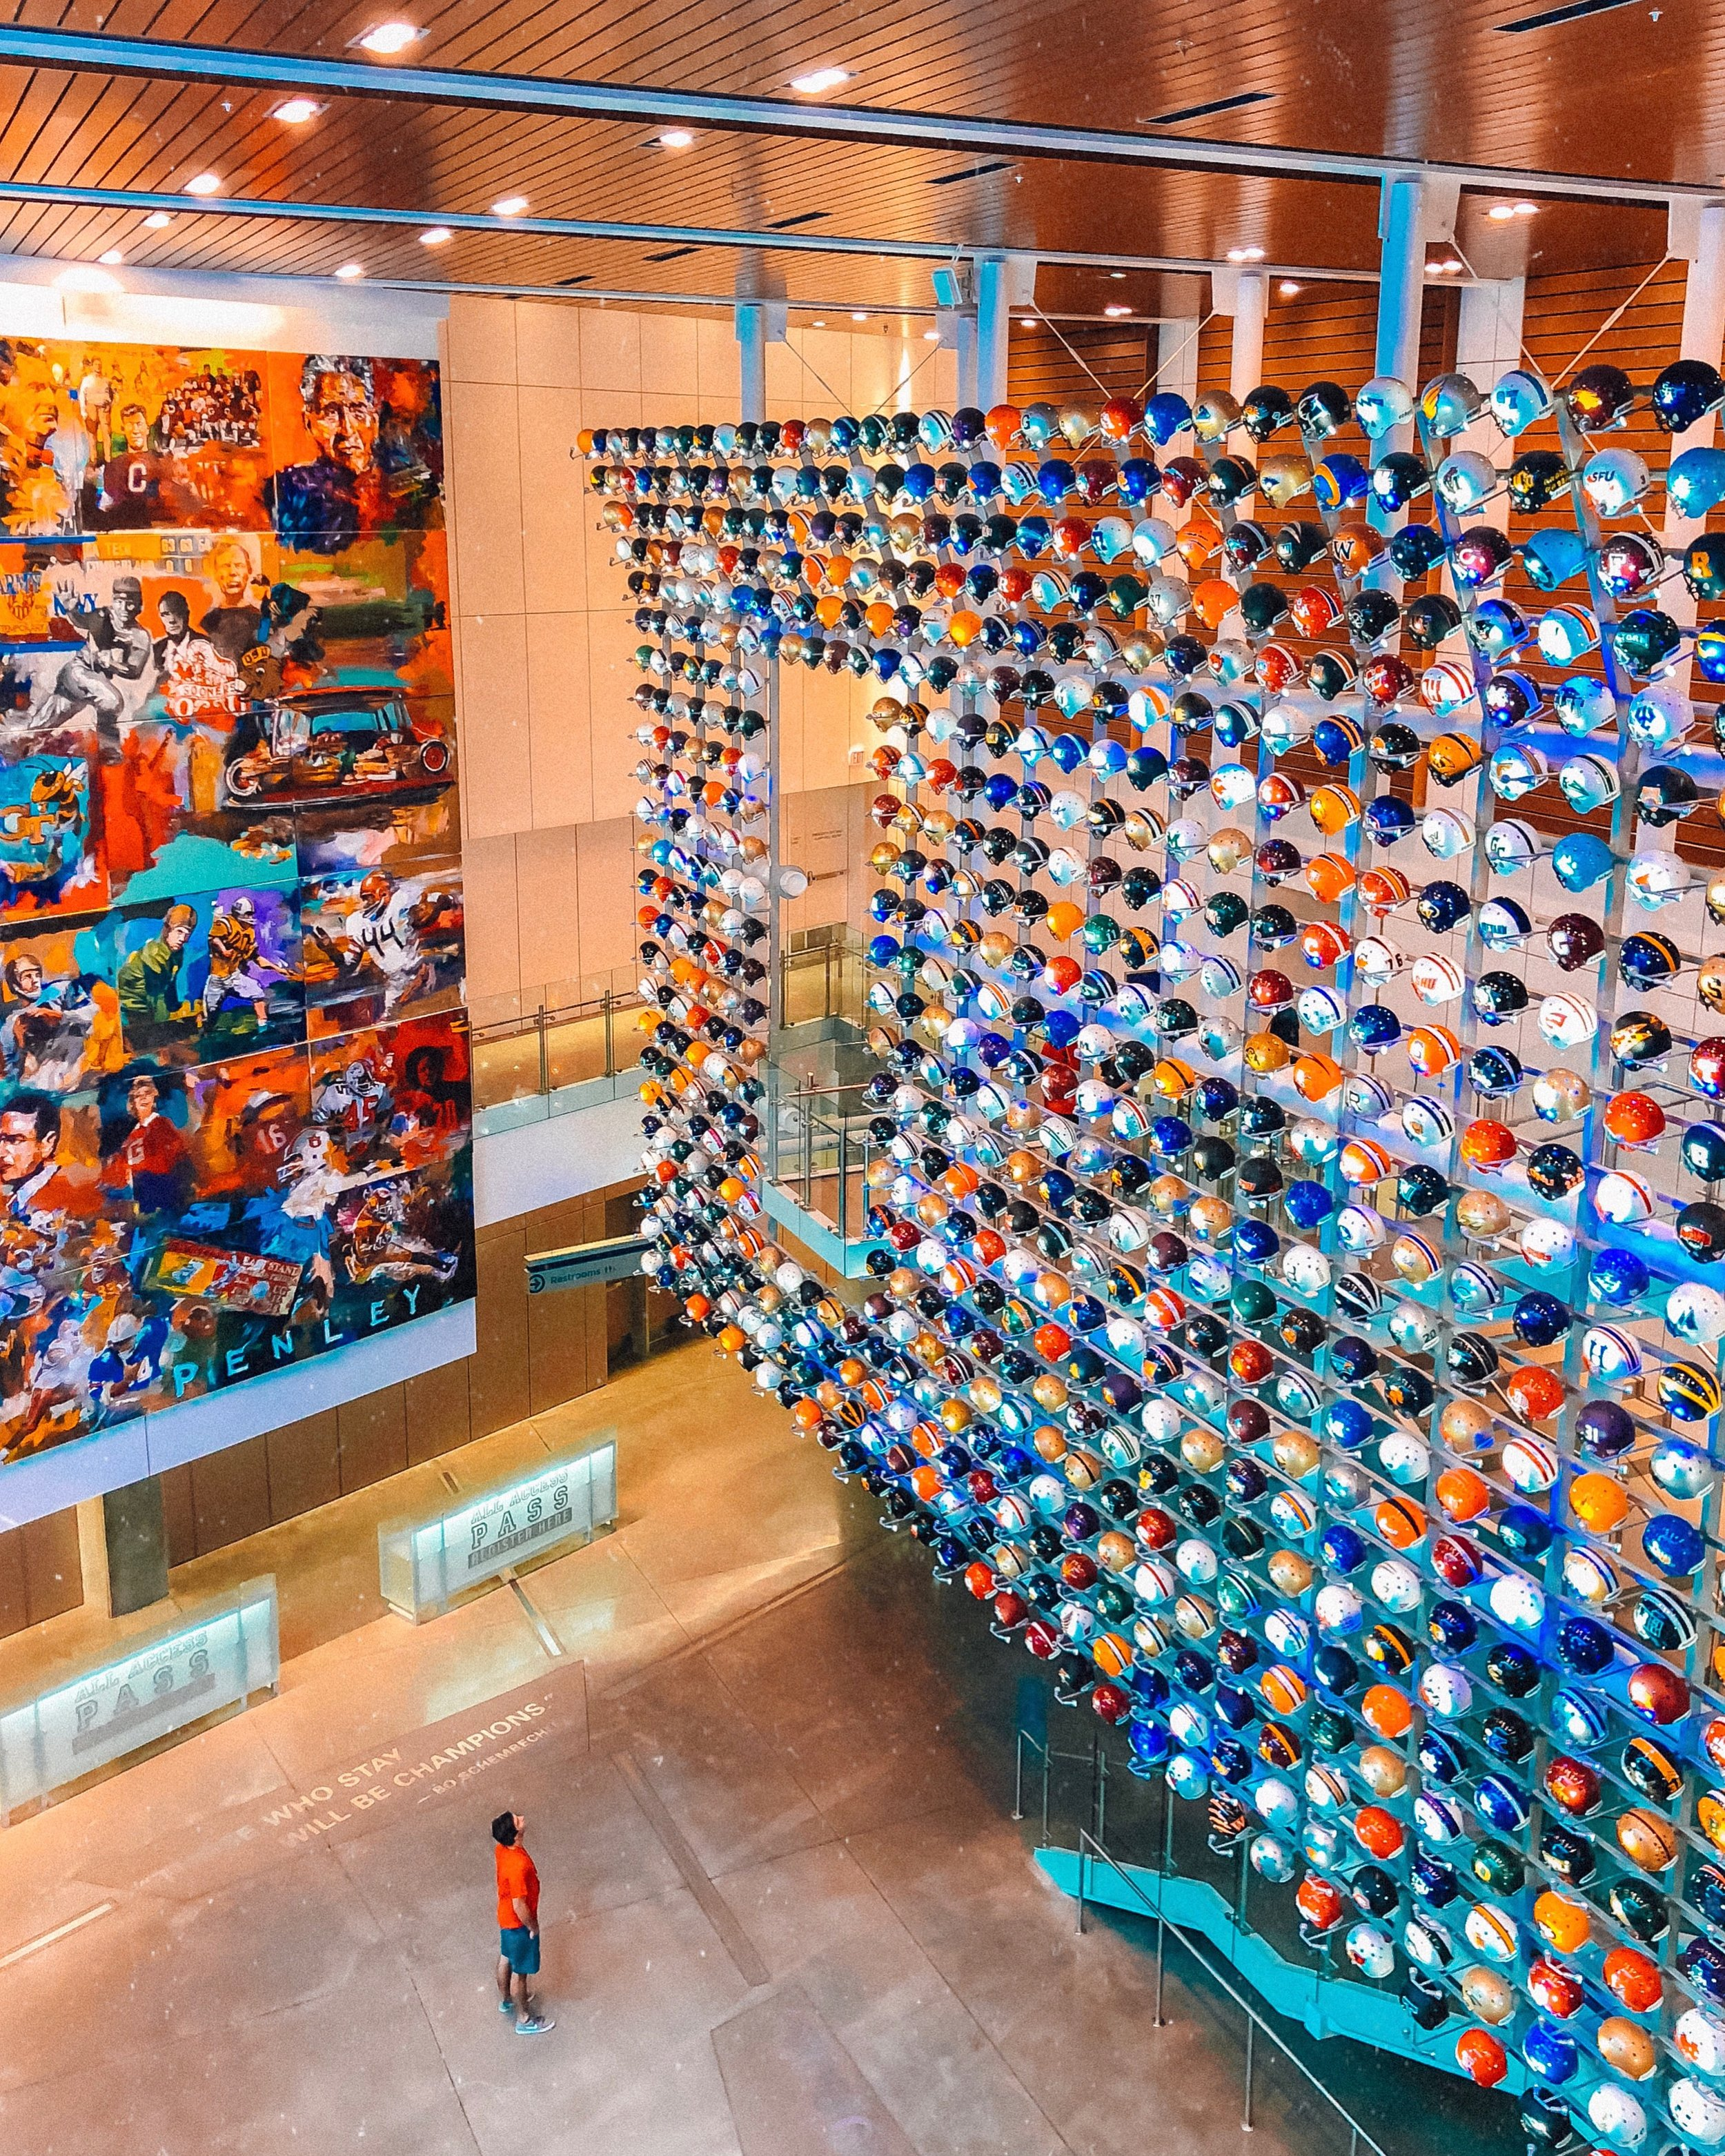 College Football Hall of Fame | Where to Visit in Atlanta | Jordan Hefler